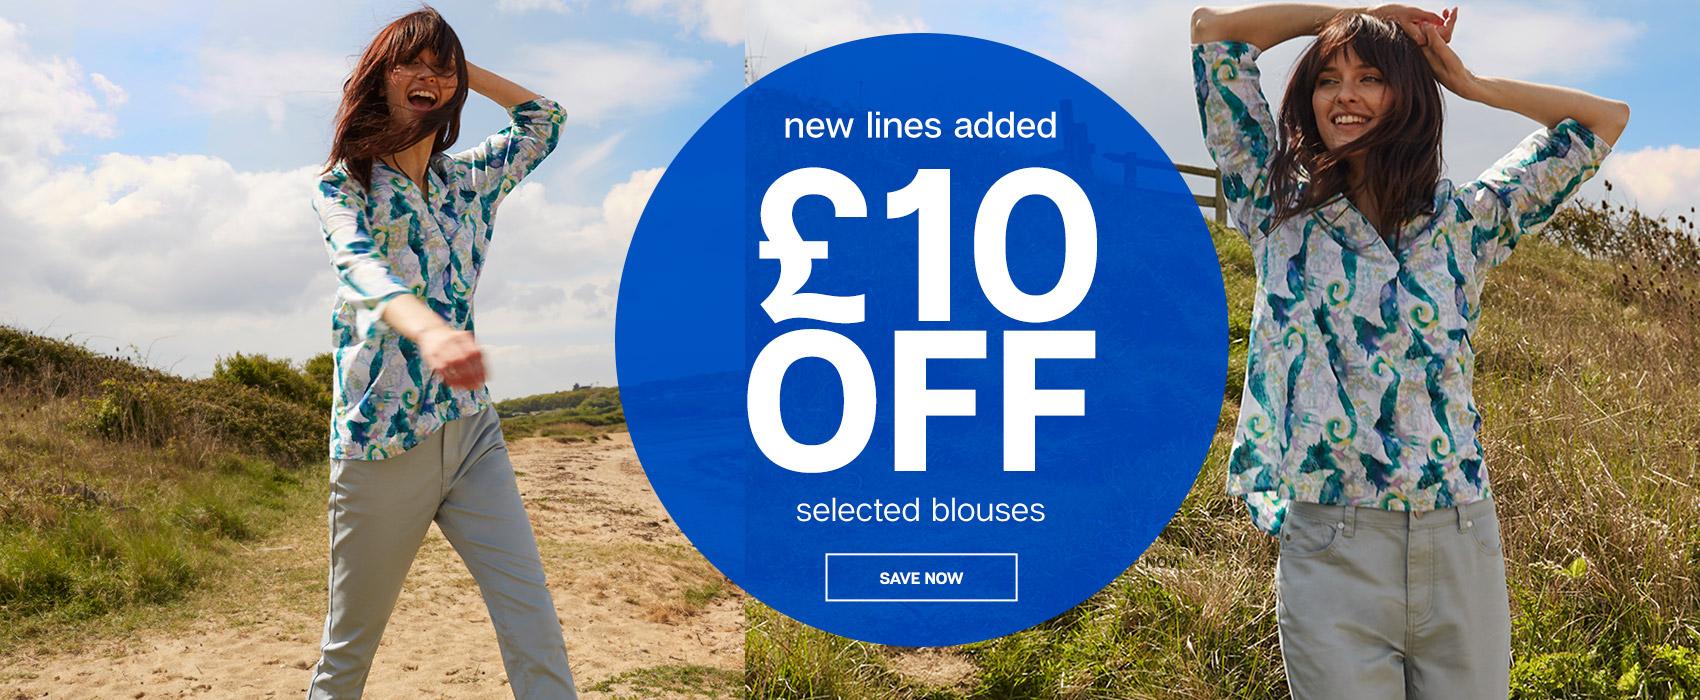 Dashfashion Dashfashion: £10 off selected blouses